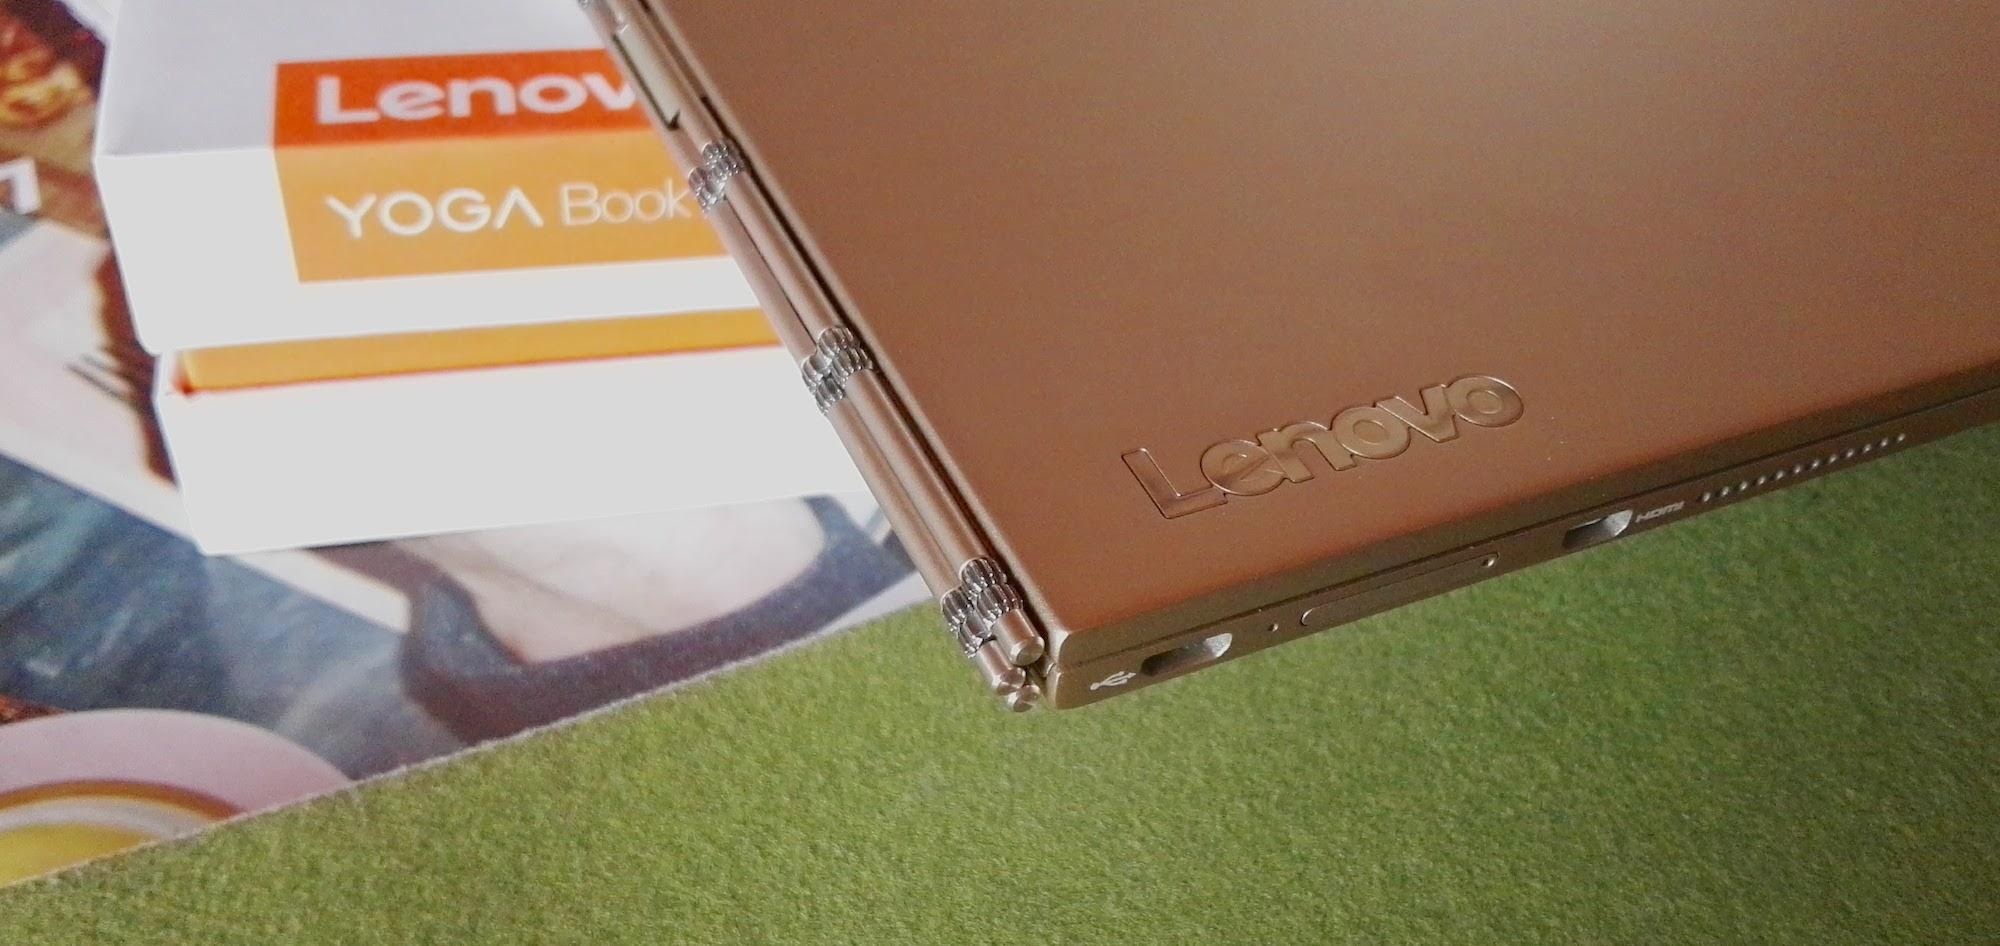 Detail of the Lenovo Yoga Book's cog hinge mechanism